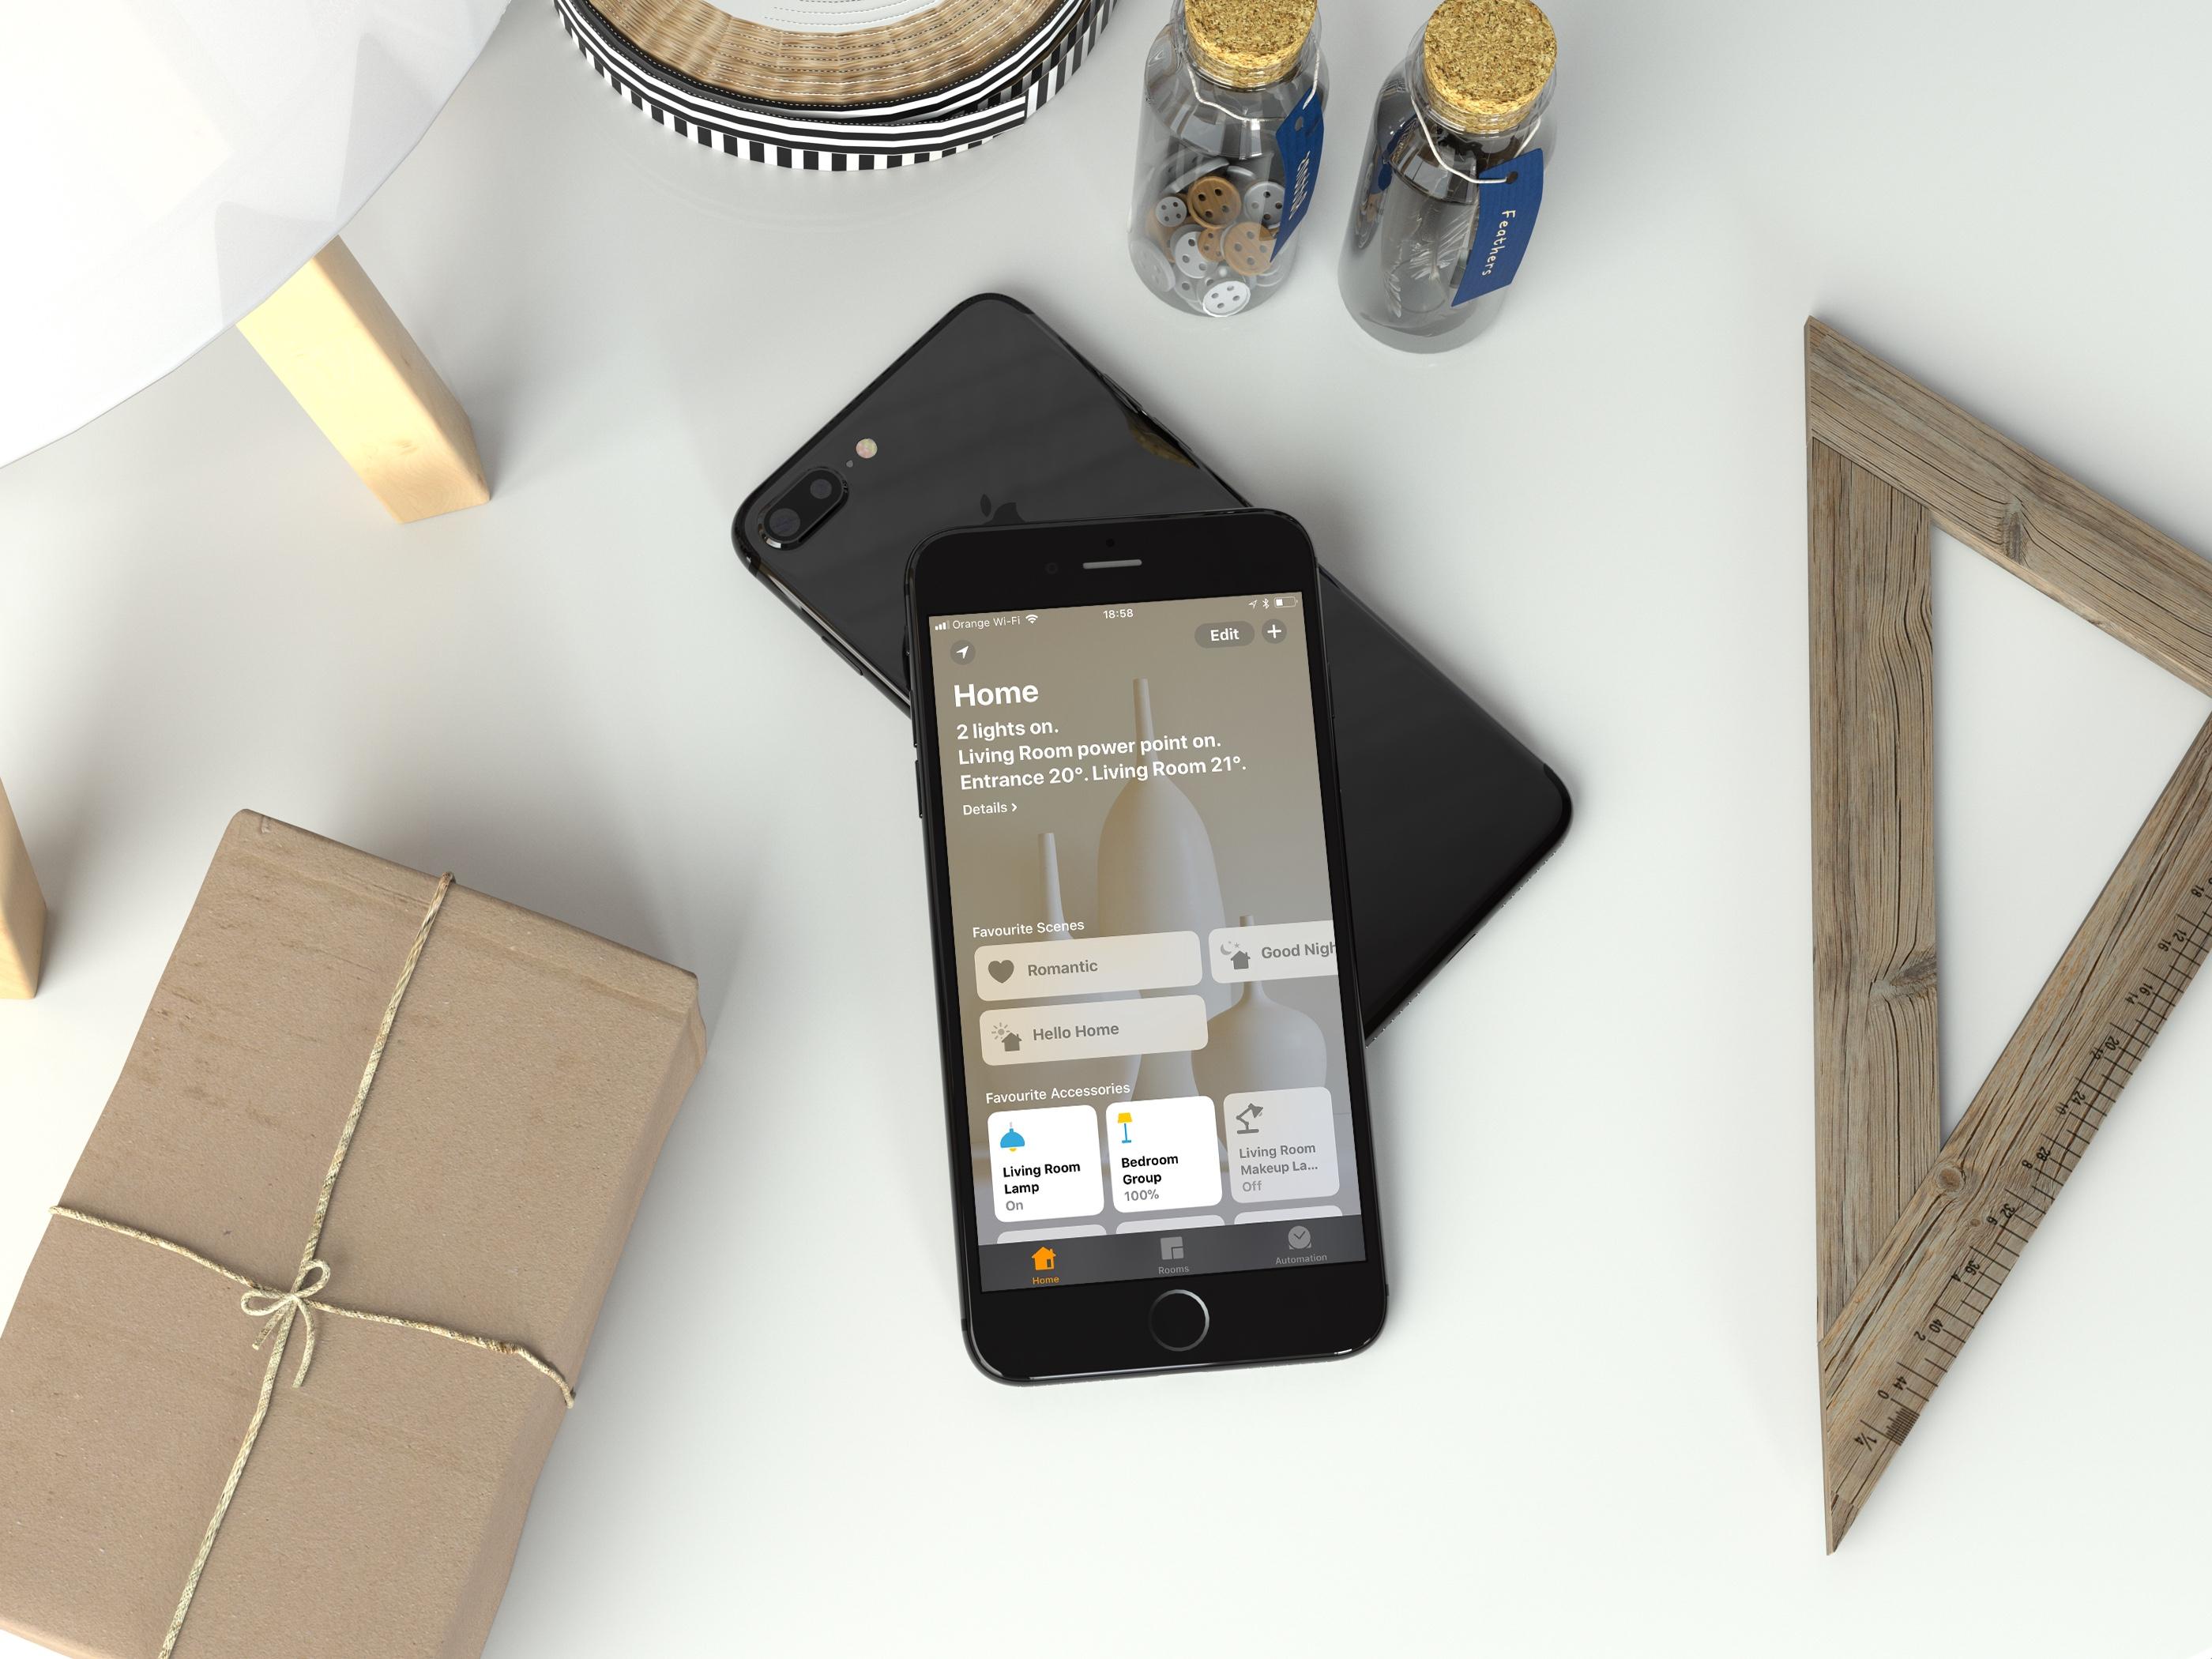 Minimalistic design - Apple Home app